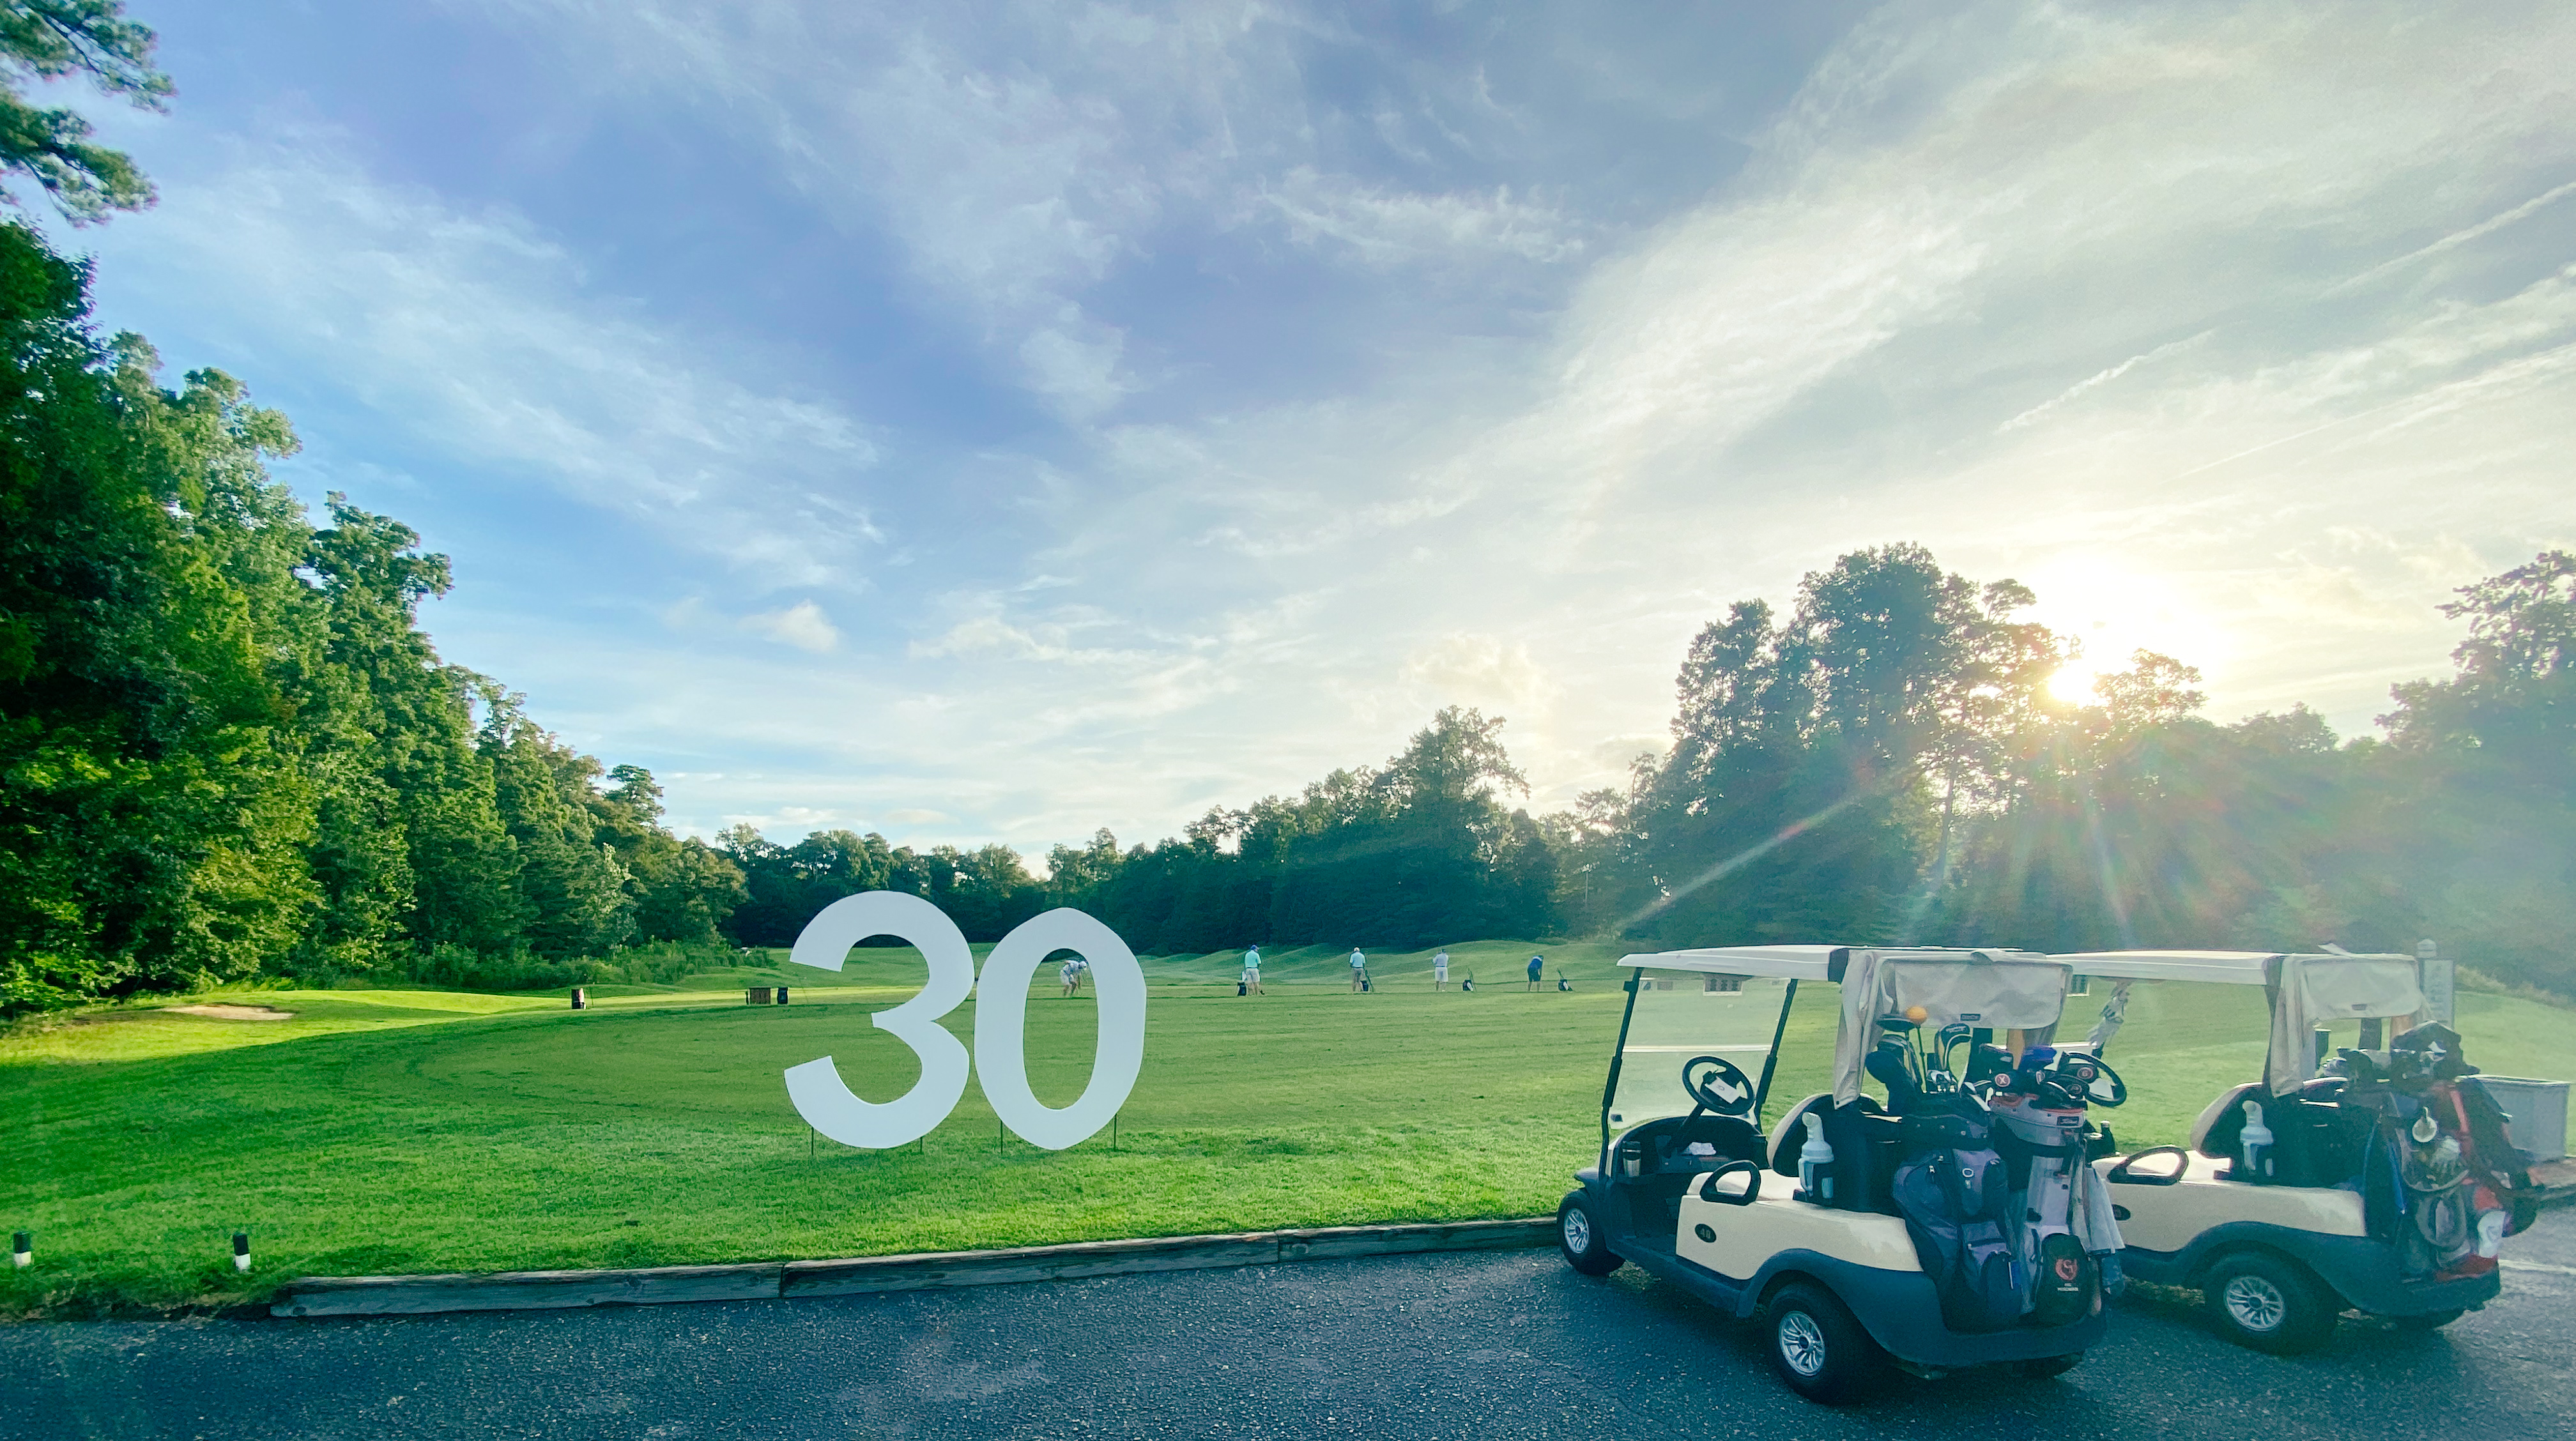 sunrise at the golf driving range